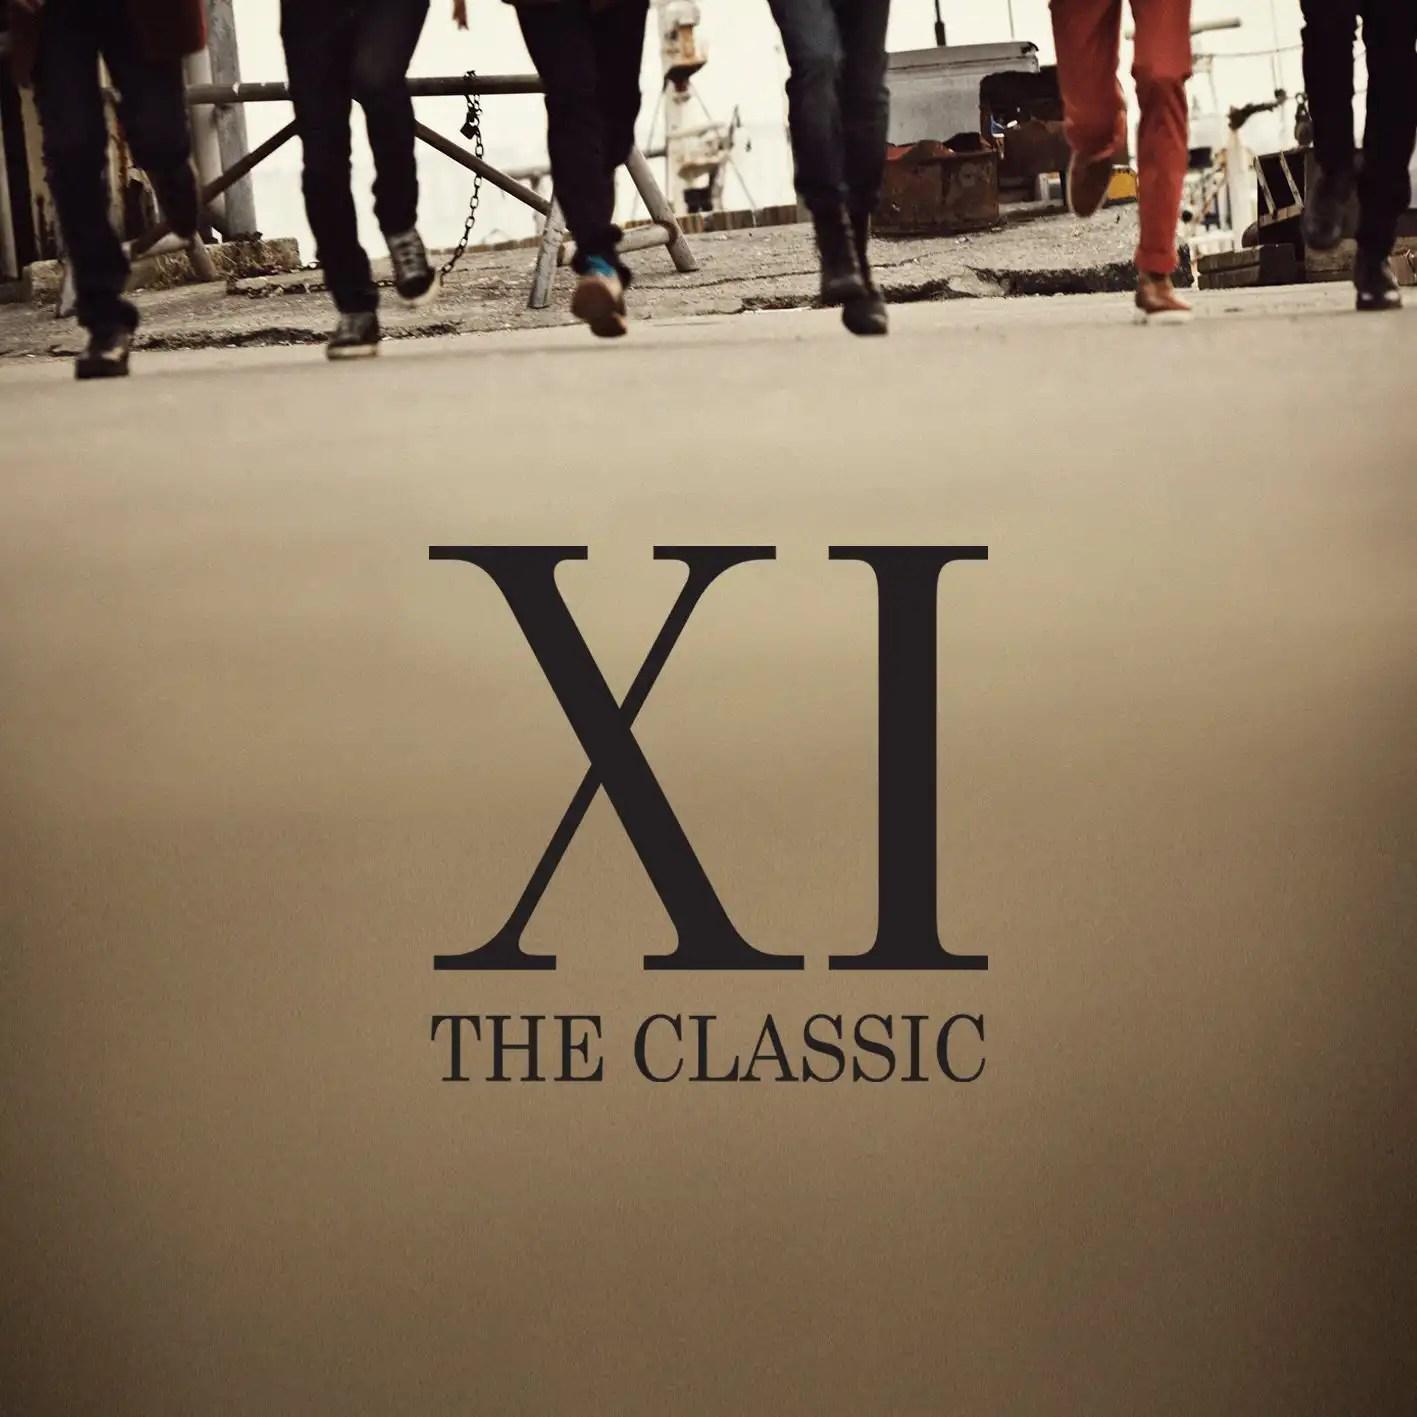 [Album] Shinhwa - THE CLASSIC [VOL. 11]